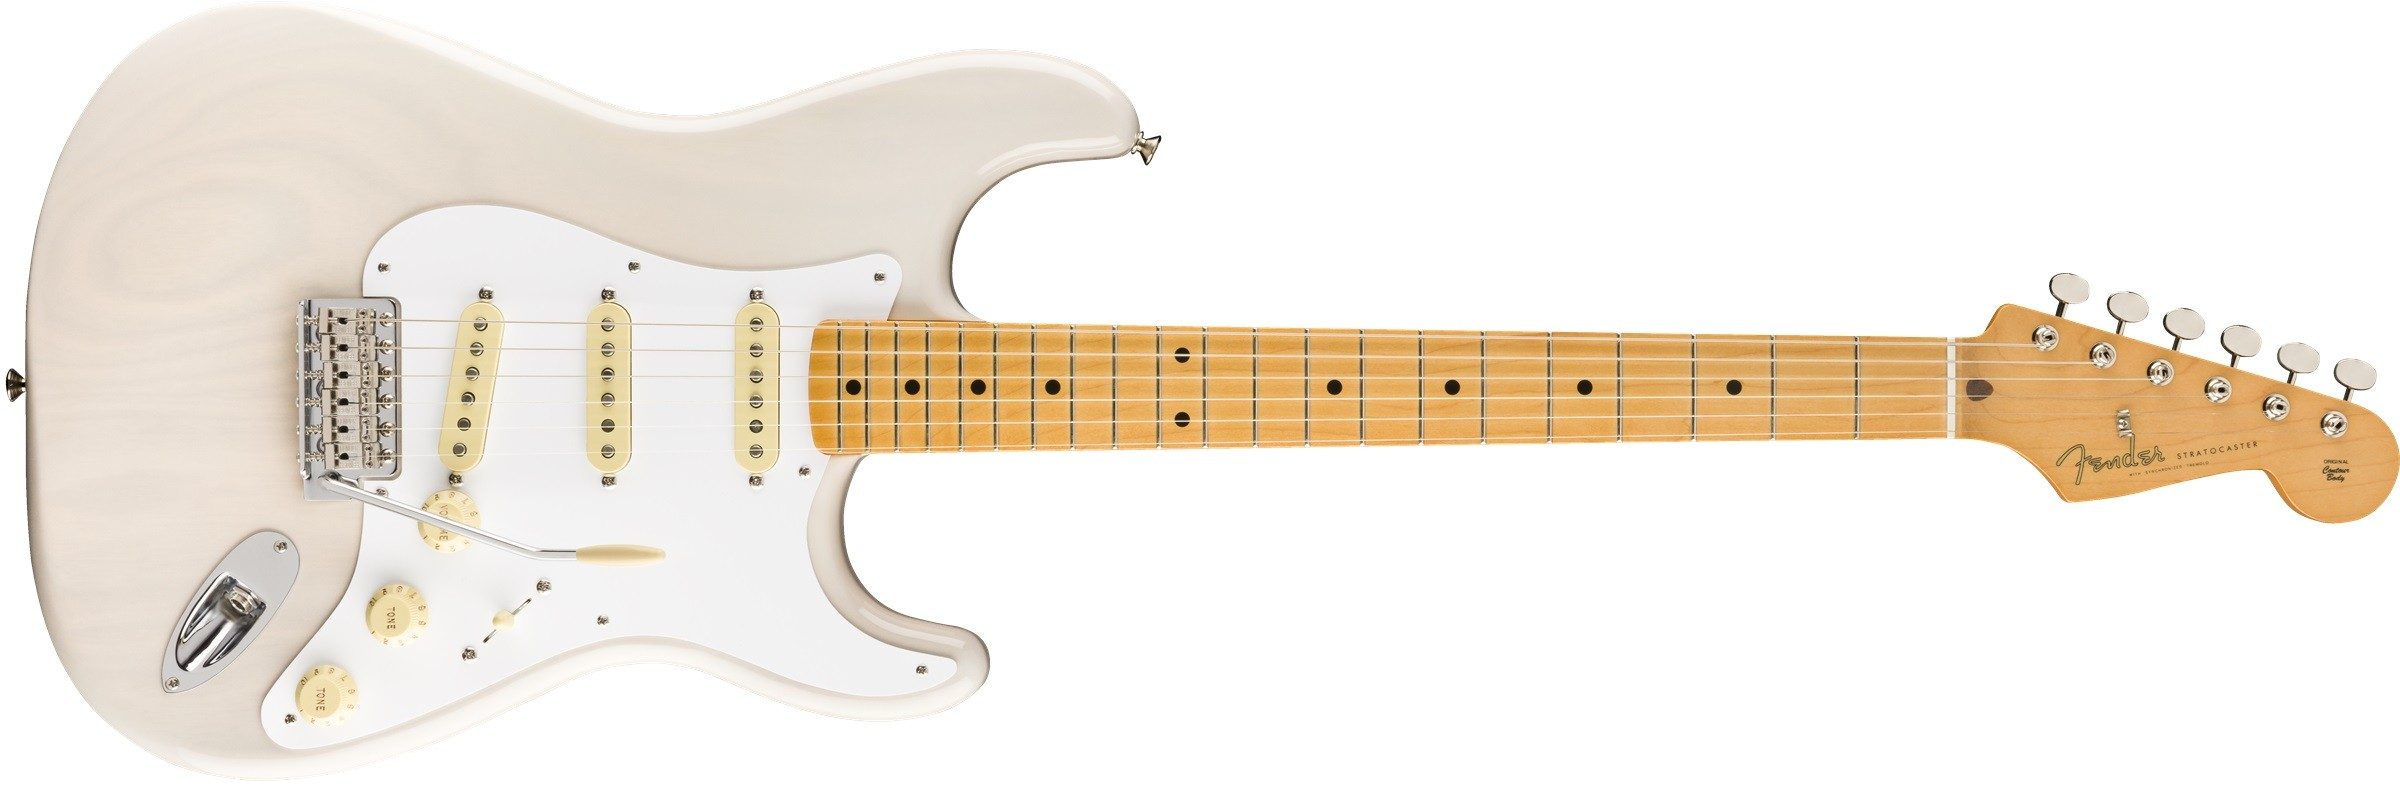 FENDER-Vintera-50s-Stratocaster-MN-White-Blonde-0149912301-sku-23628